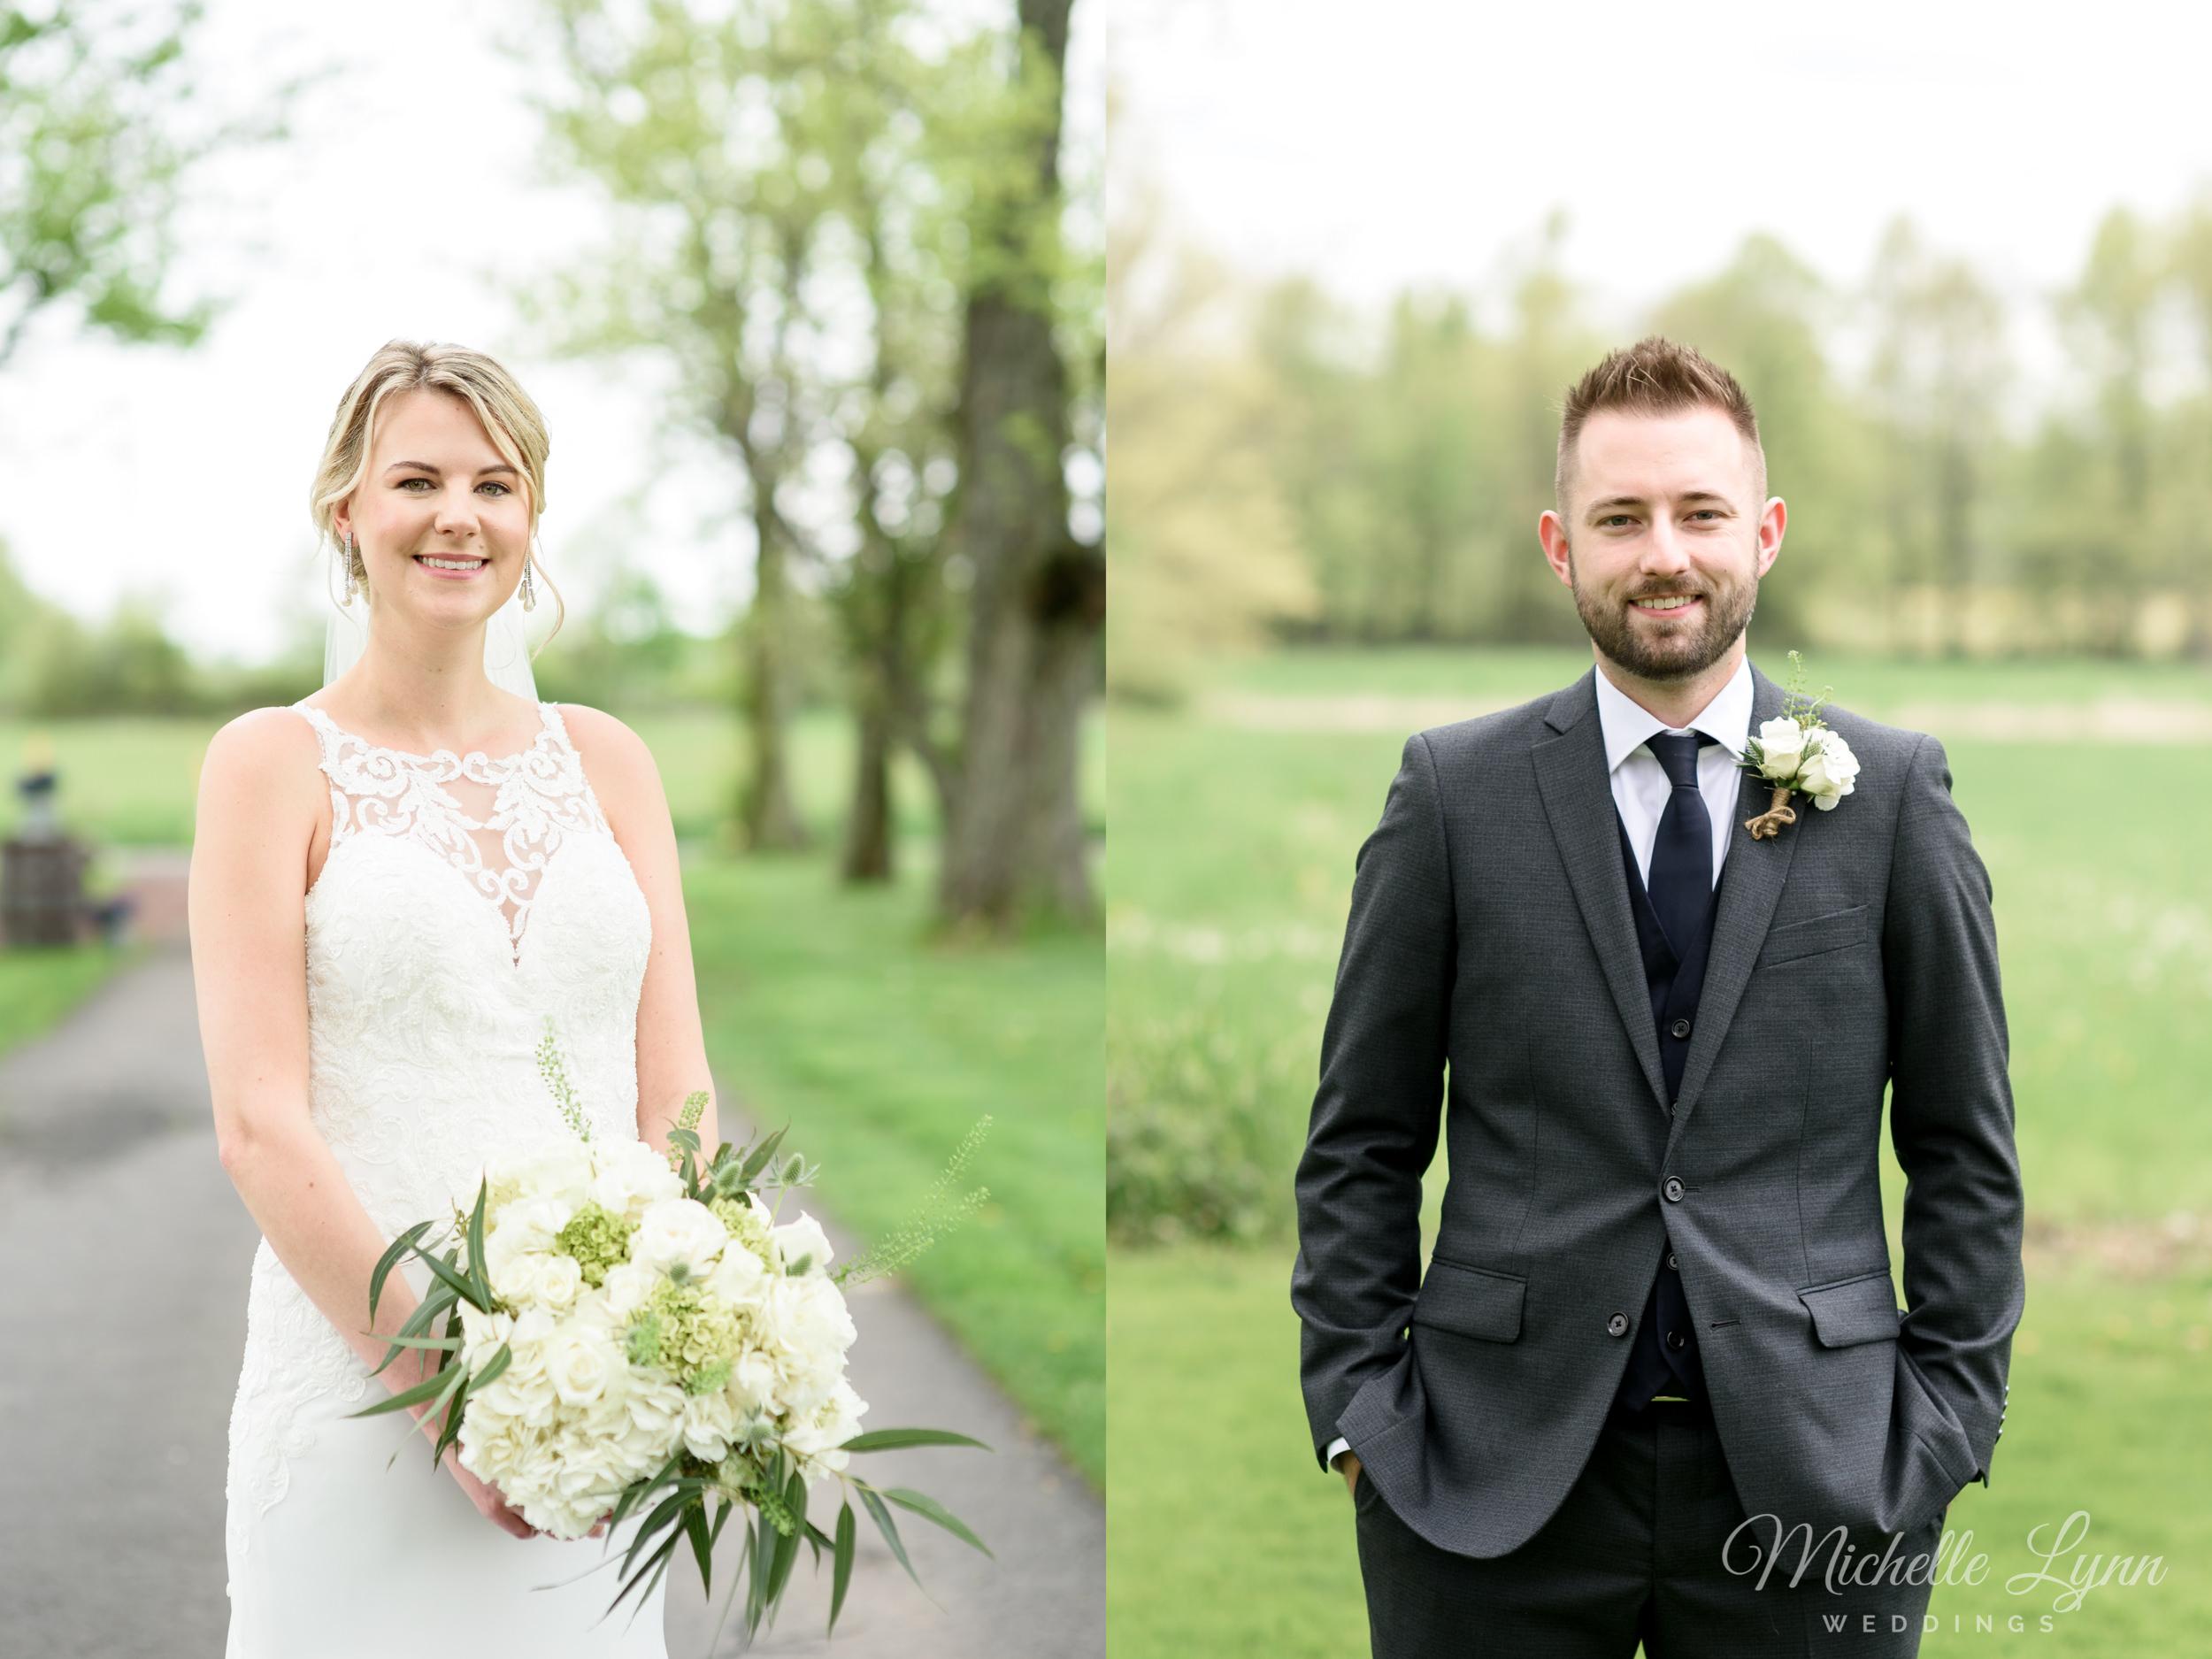 mlw-the-farm-bakery-and-events-wedding-photos-22.jpg